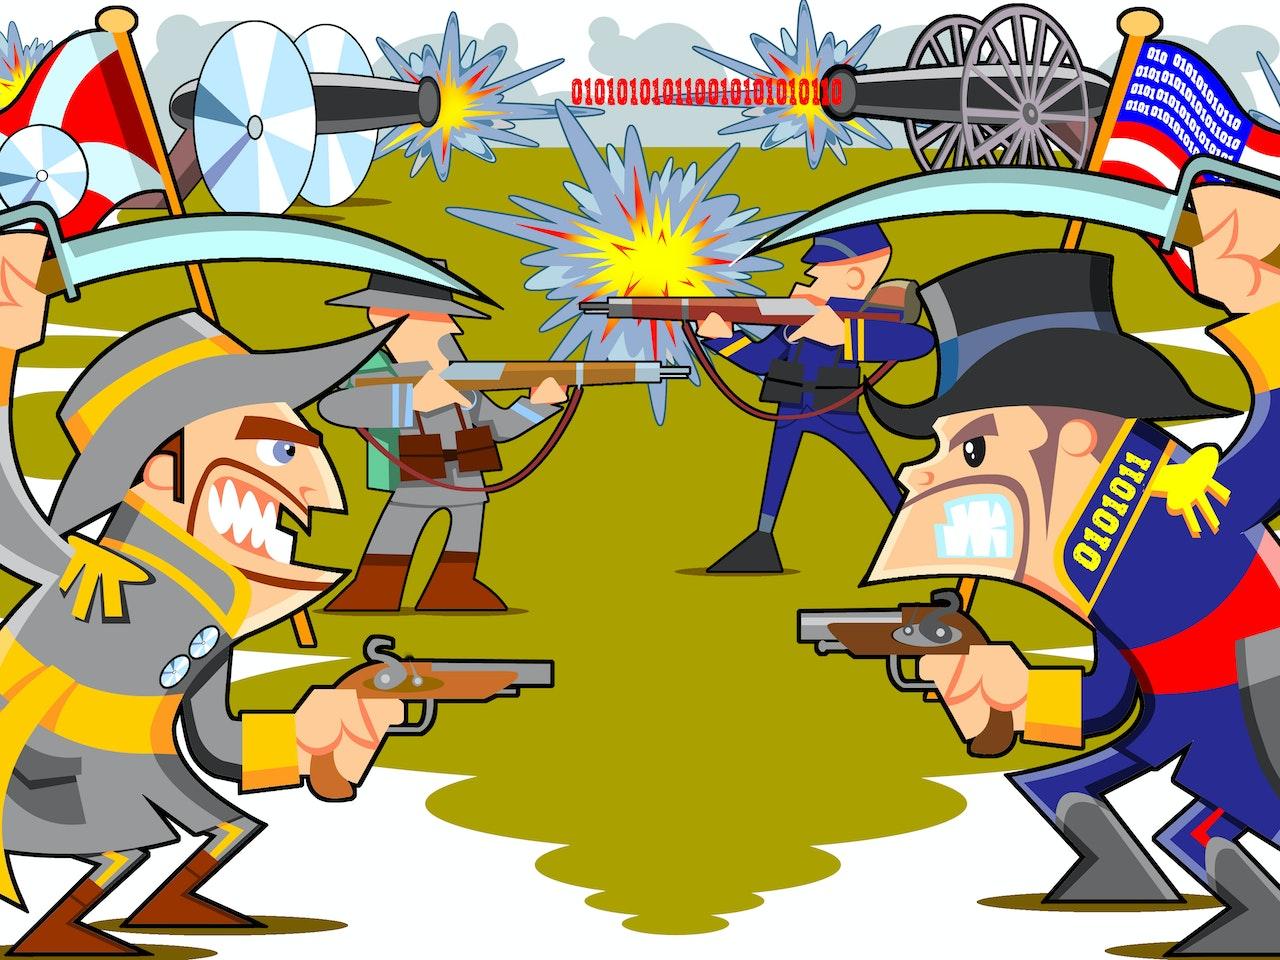 funny comical American civil war cartoon confederate union soldier cannon war battle army